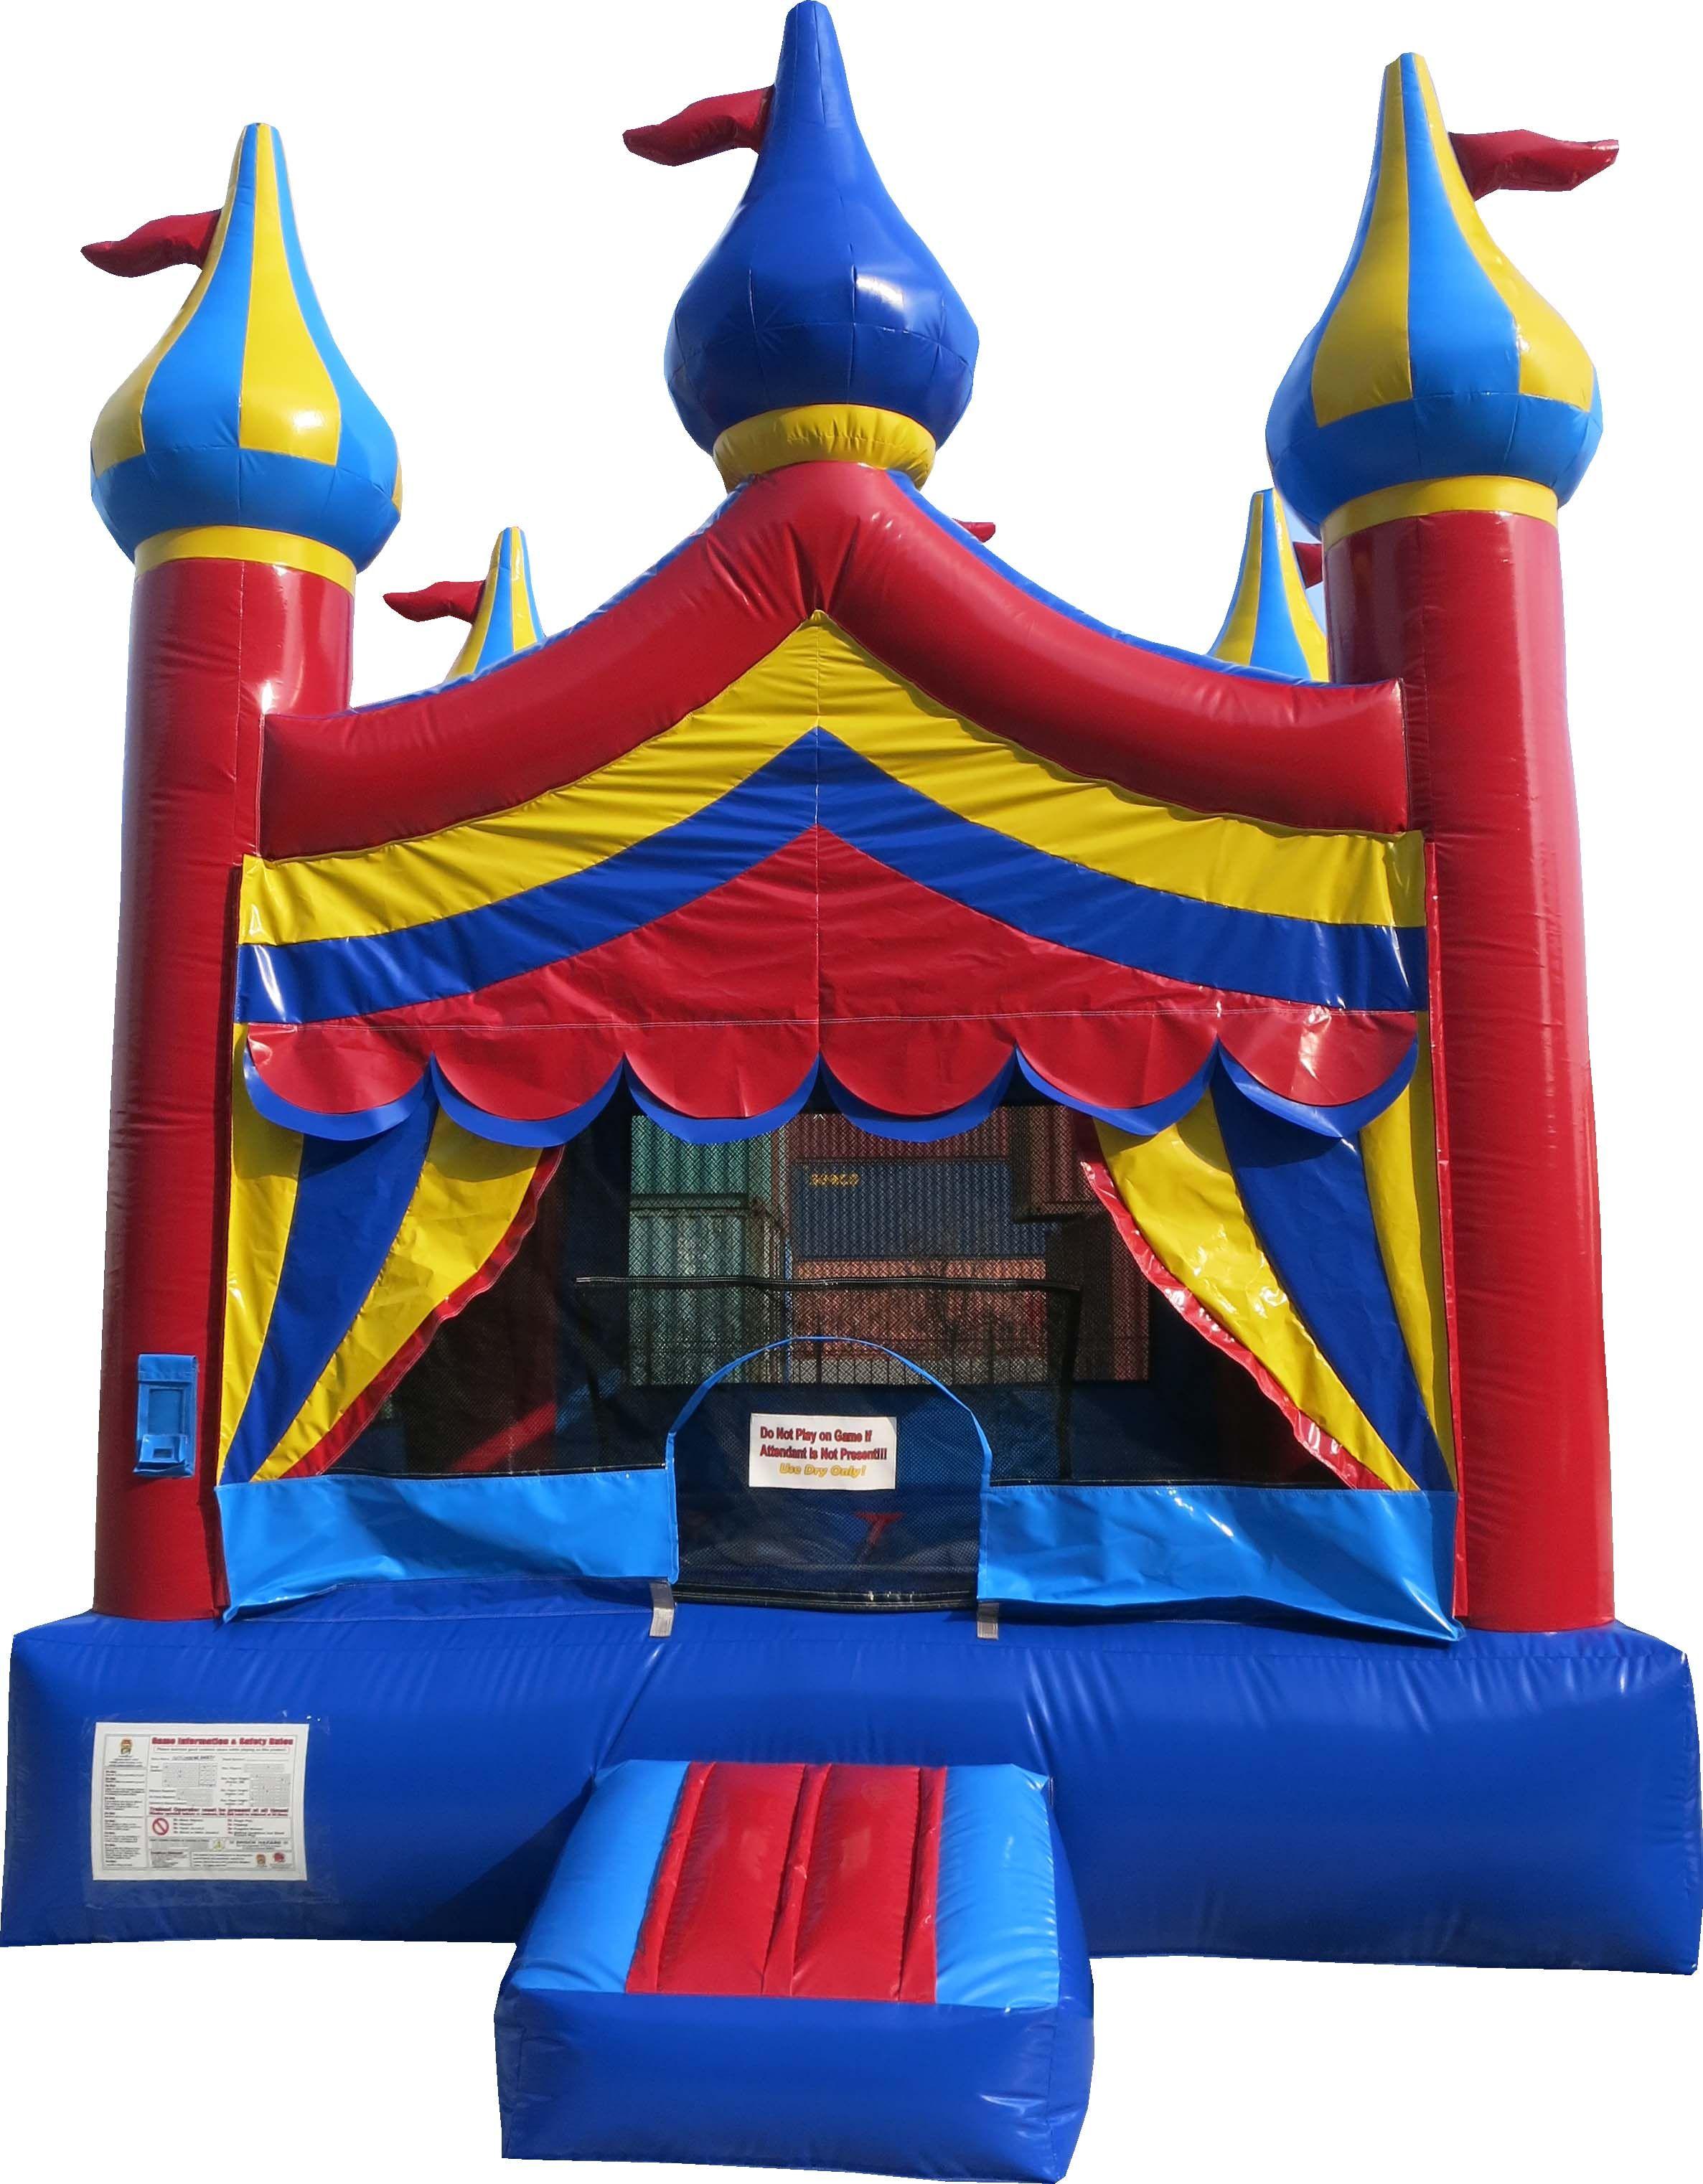 Bouncy Castle Rentals Toronto Castle Rental Bouncy Castle Bouncy